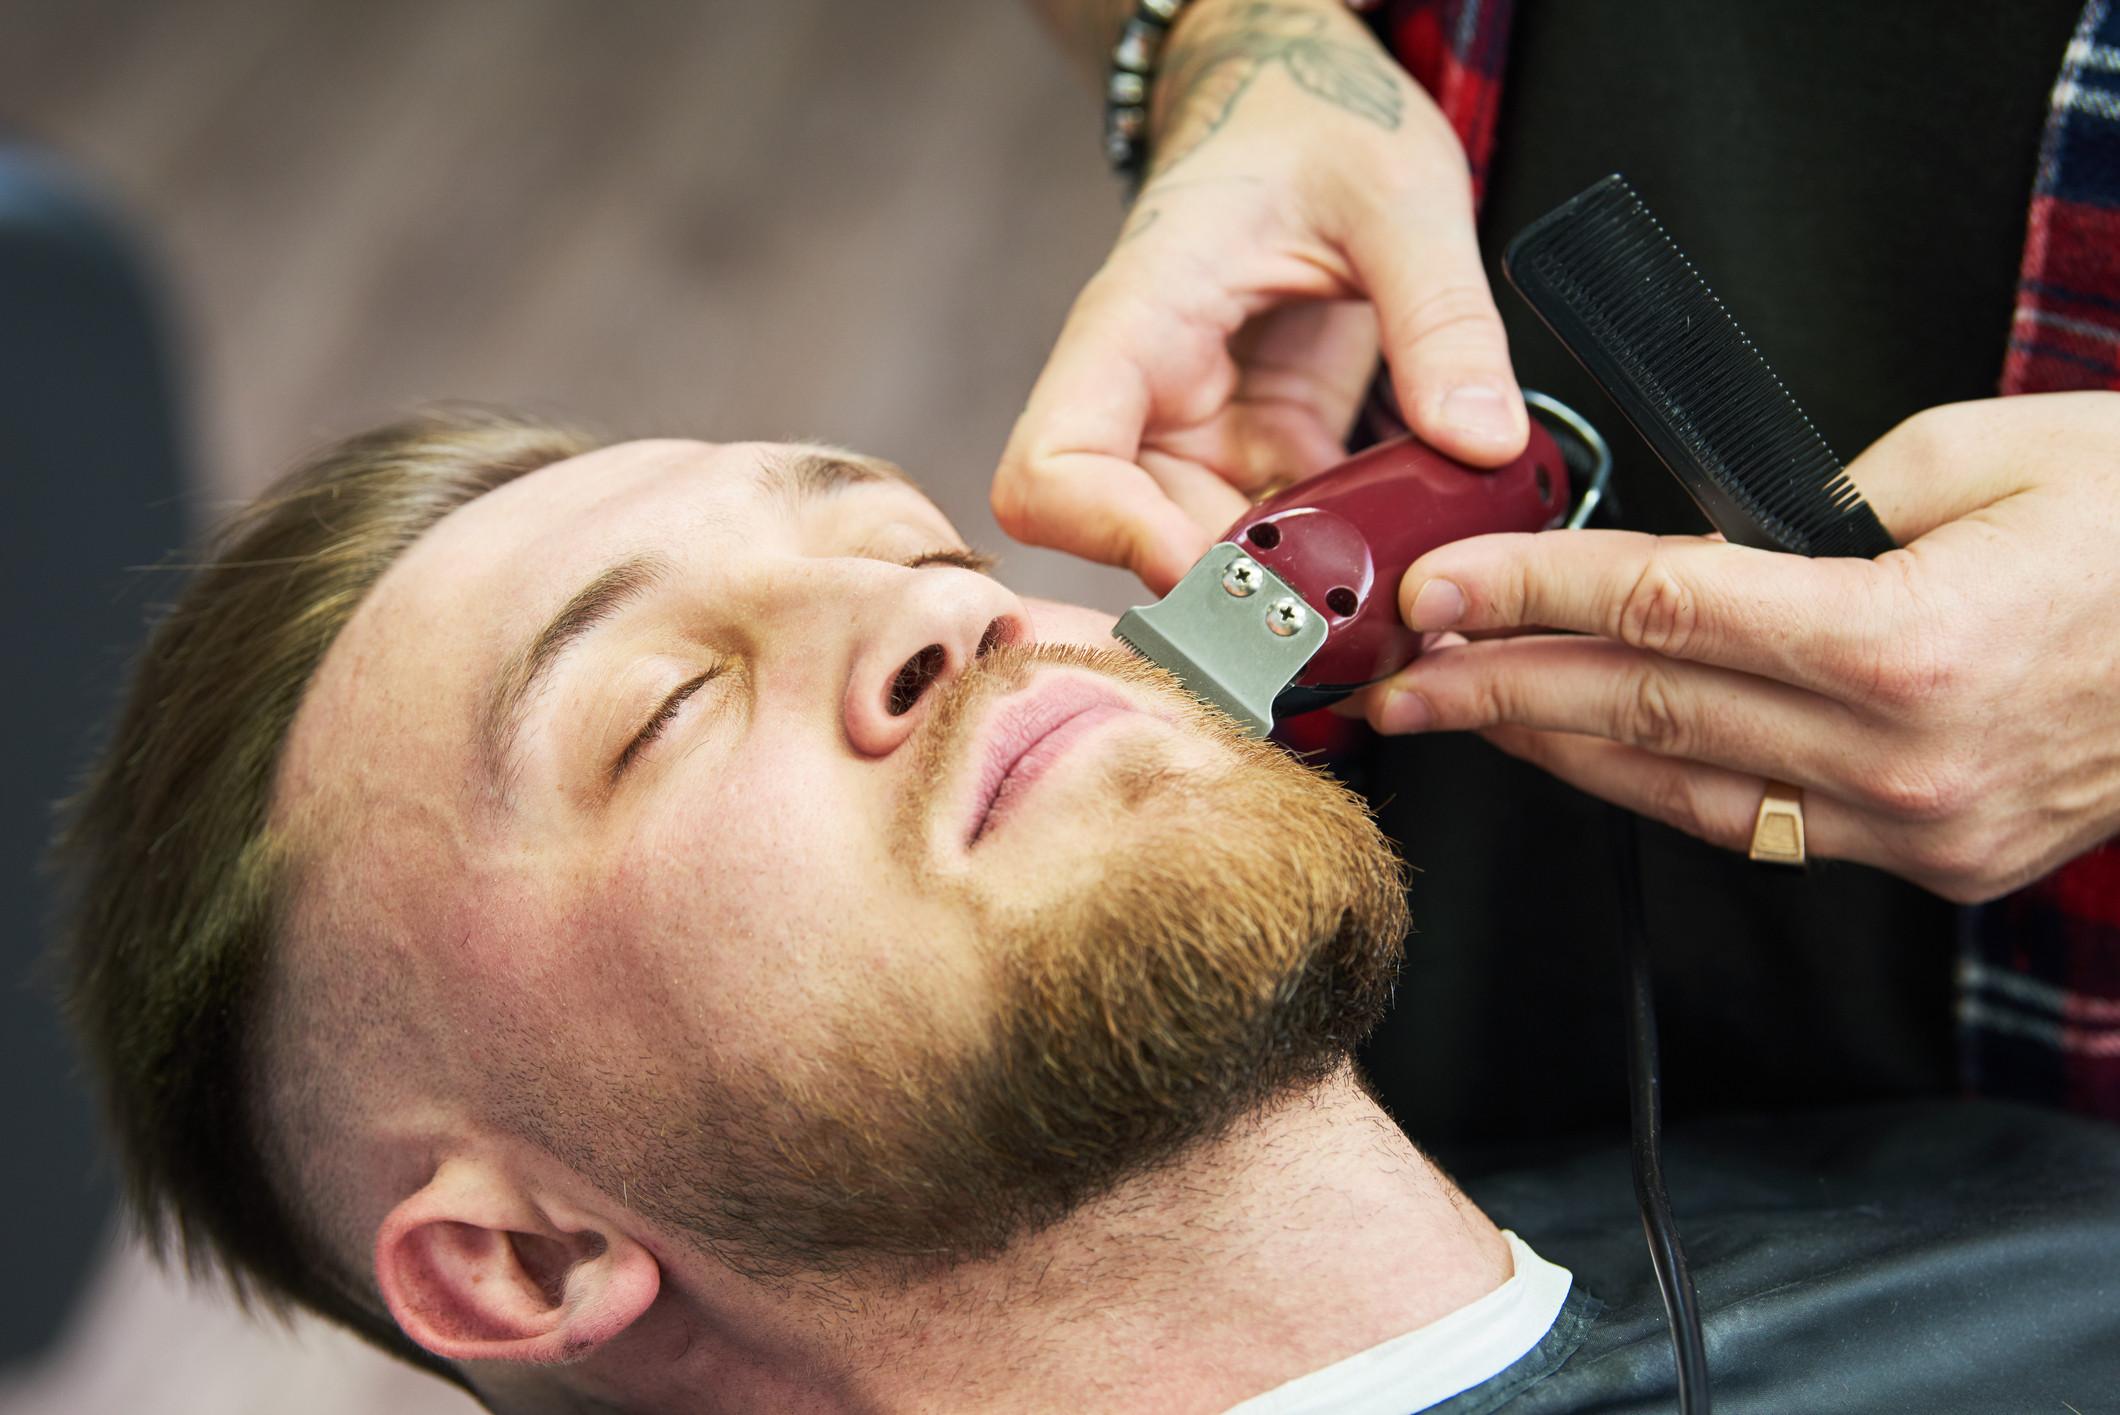 Beard Trim/ Shave/ Line Up